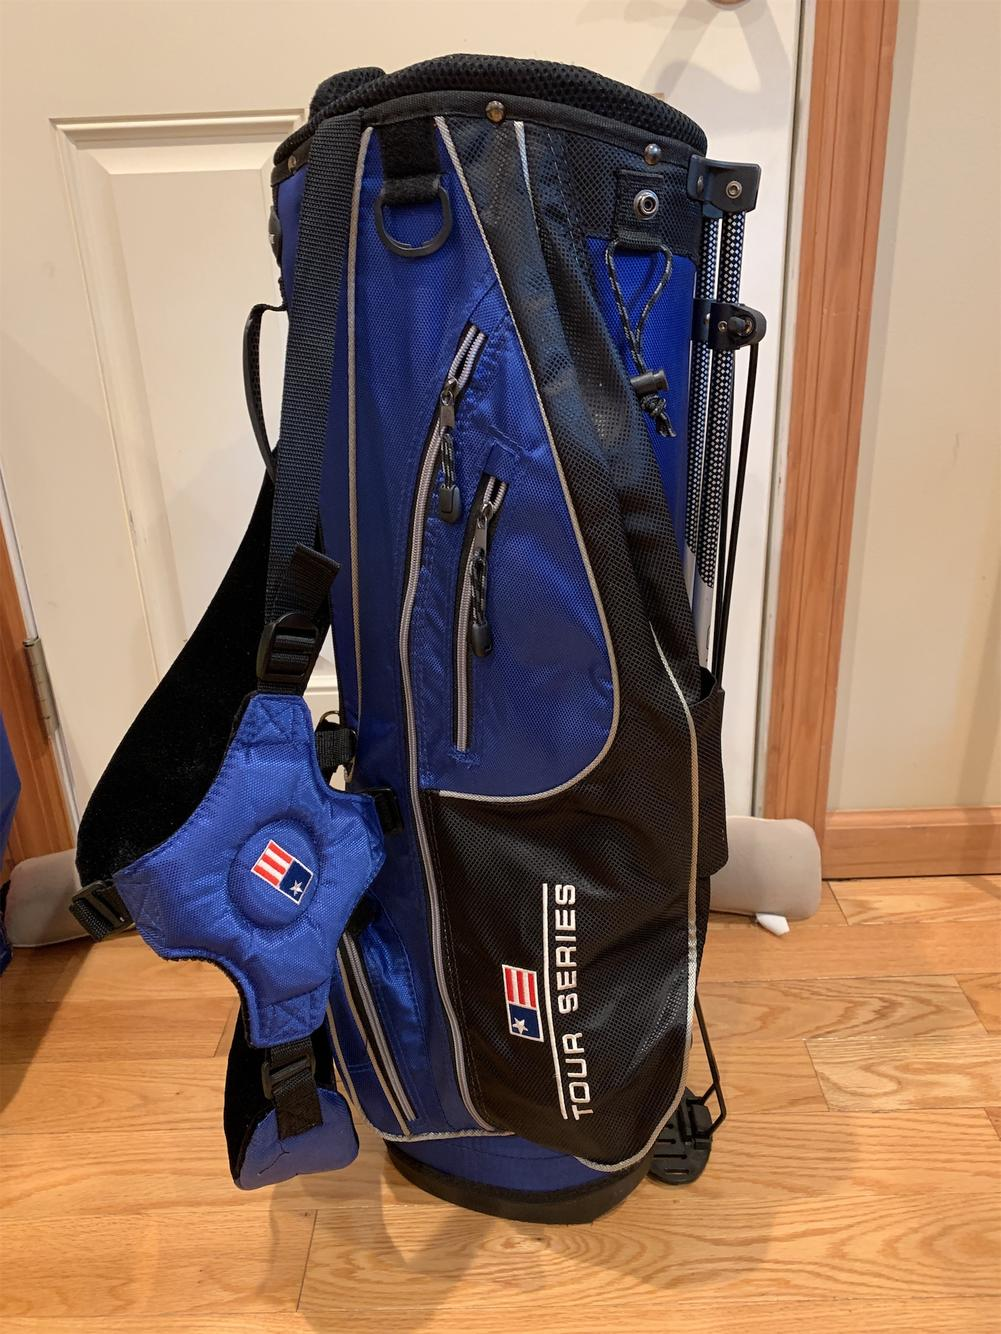 Kids Junior Bag Bumped Golf Bags Carts